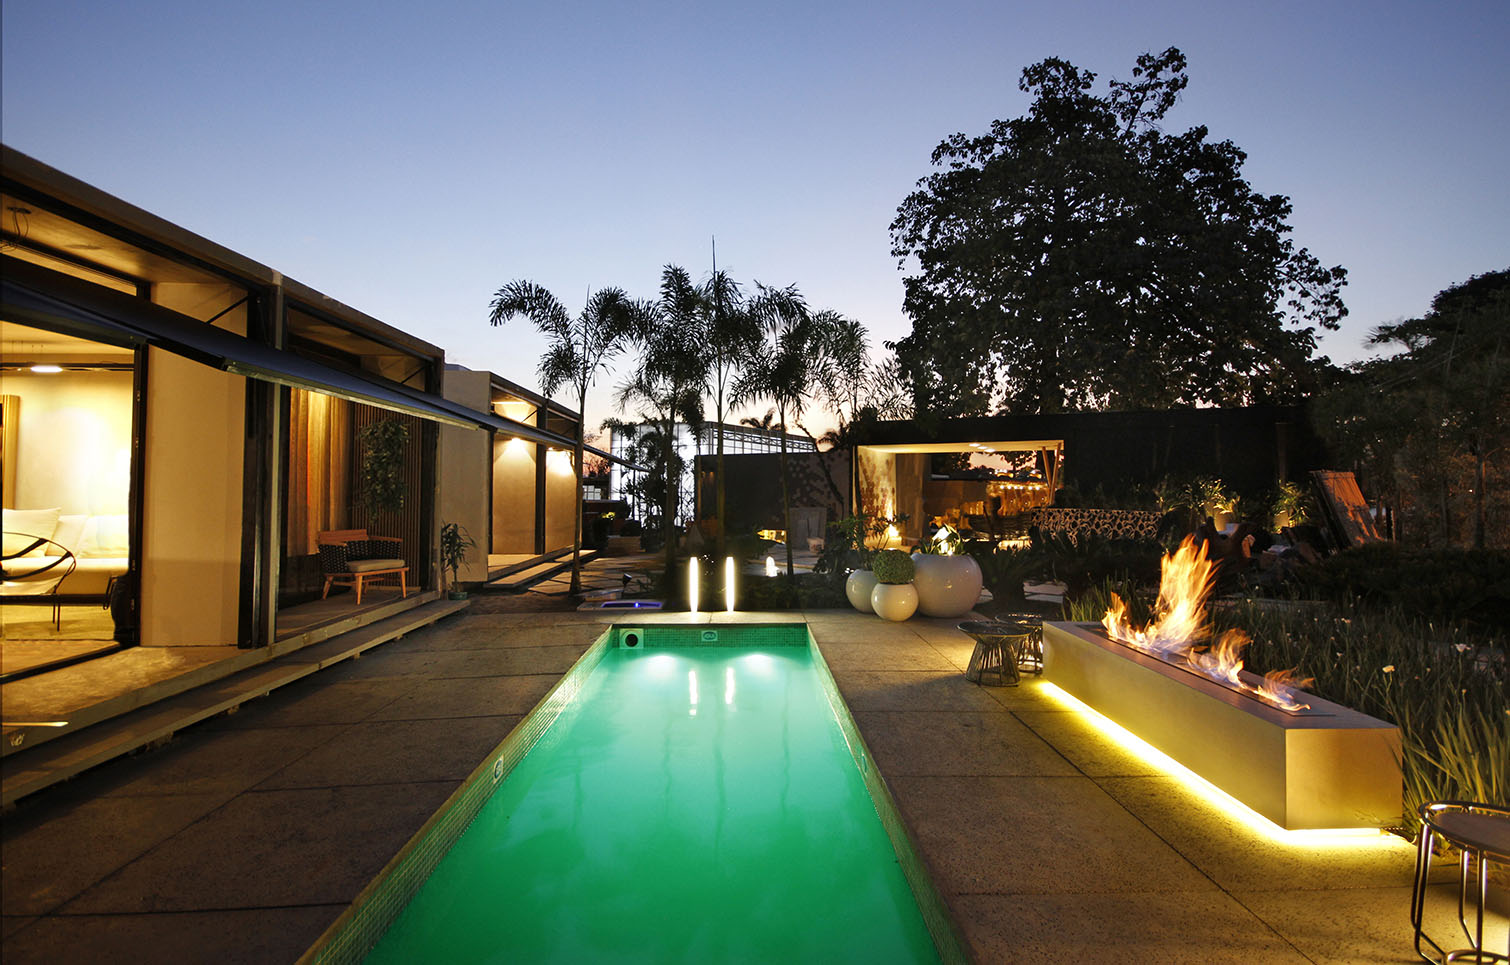 CLS Arquitetura _ Casa Cor Minas 2016 _Hemerson Gomes _ tratada